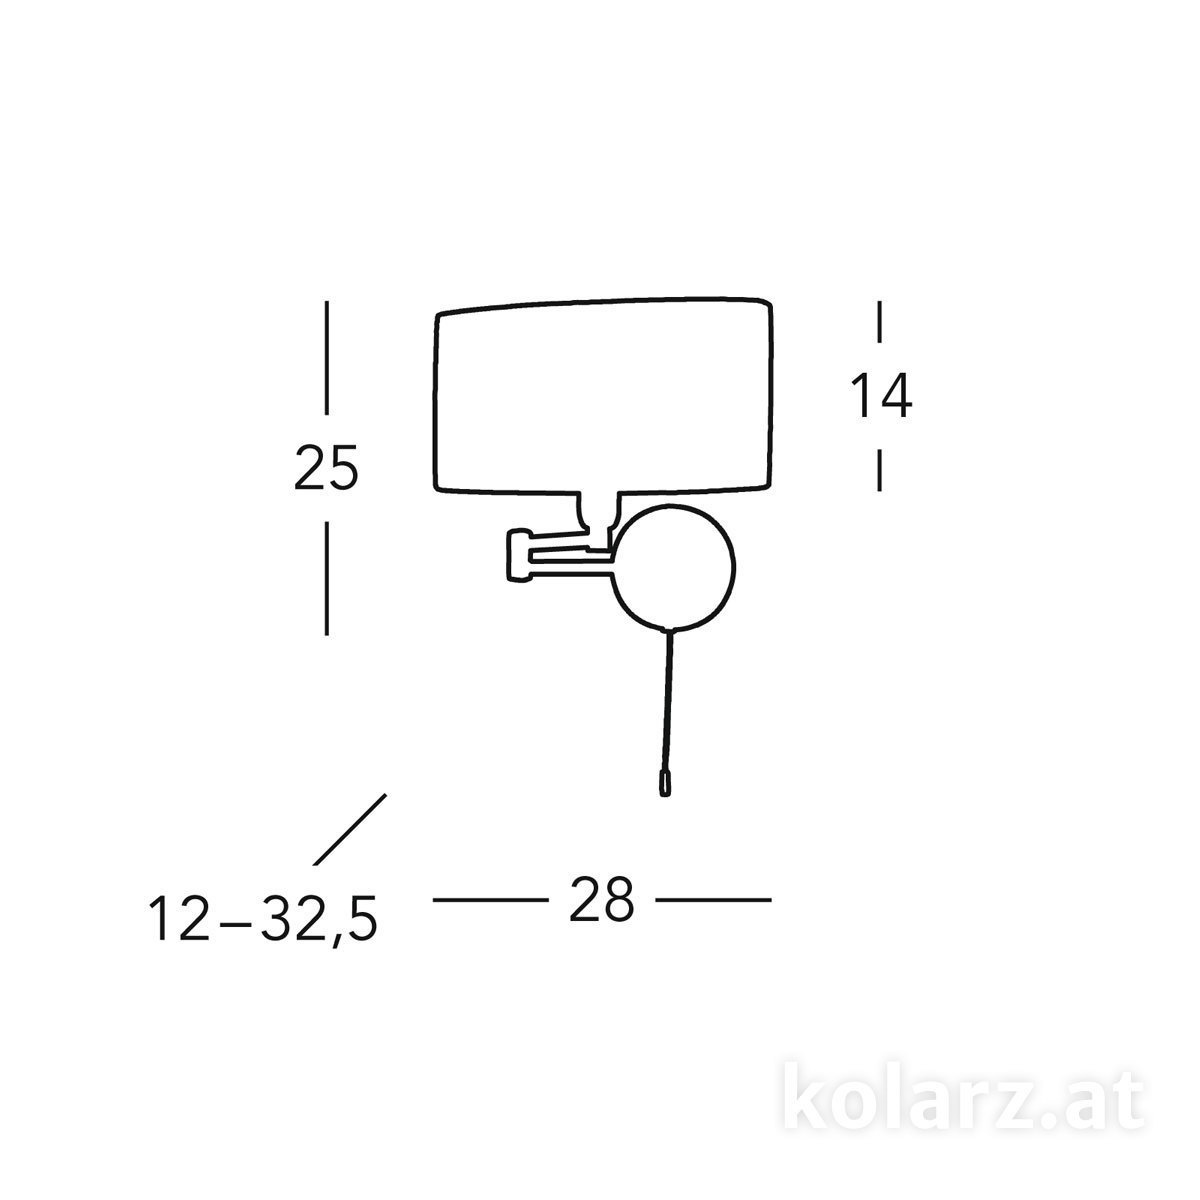 1264-61-4-s1.jpg